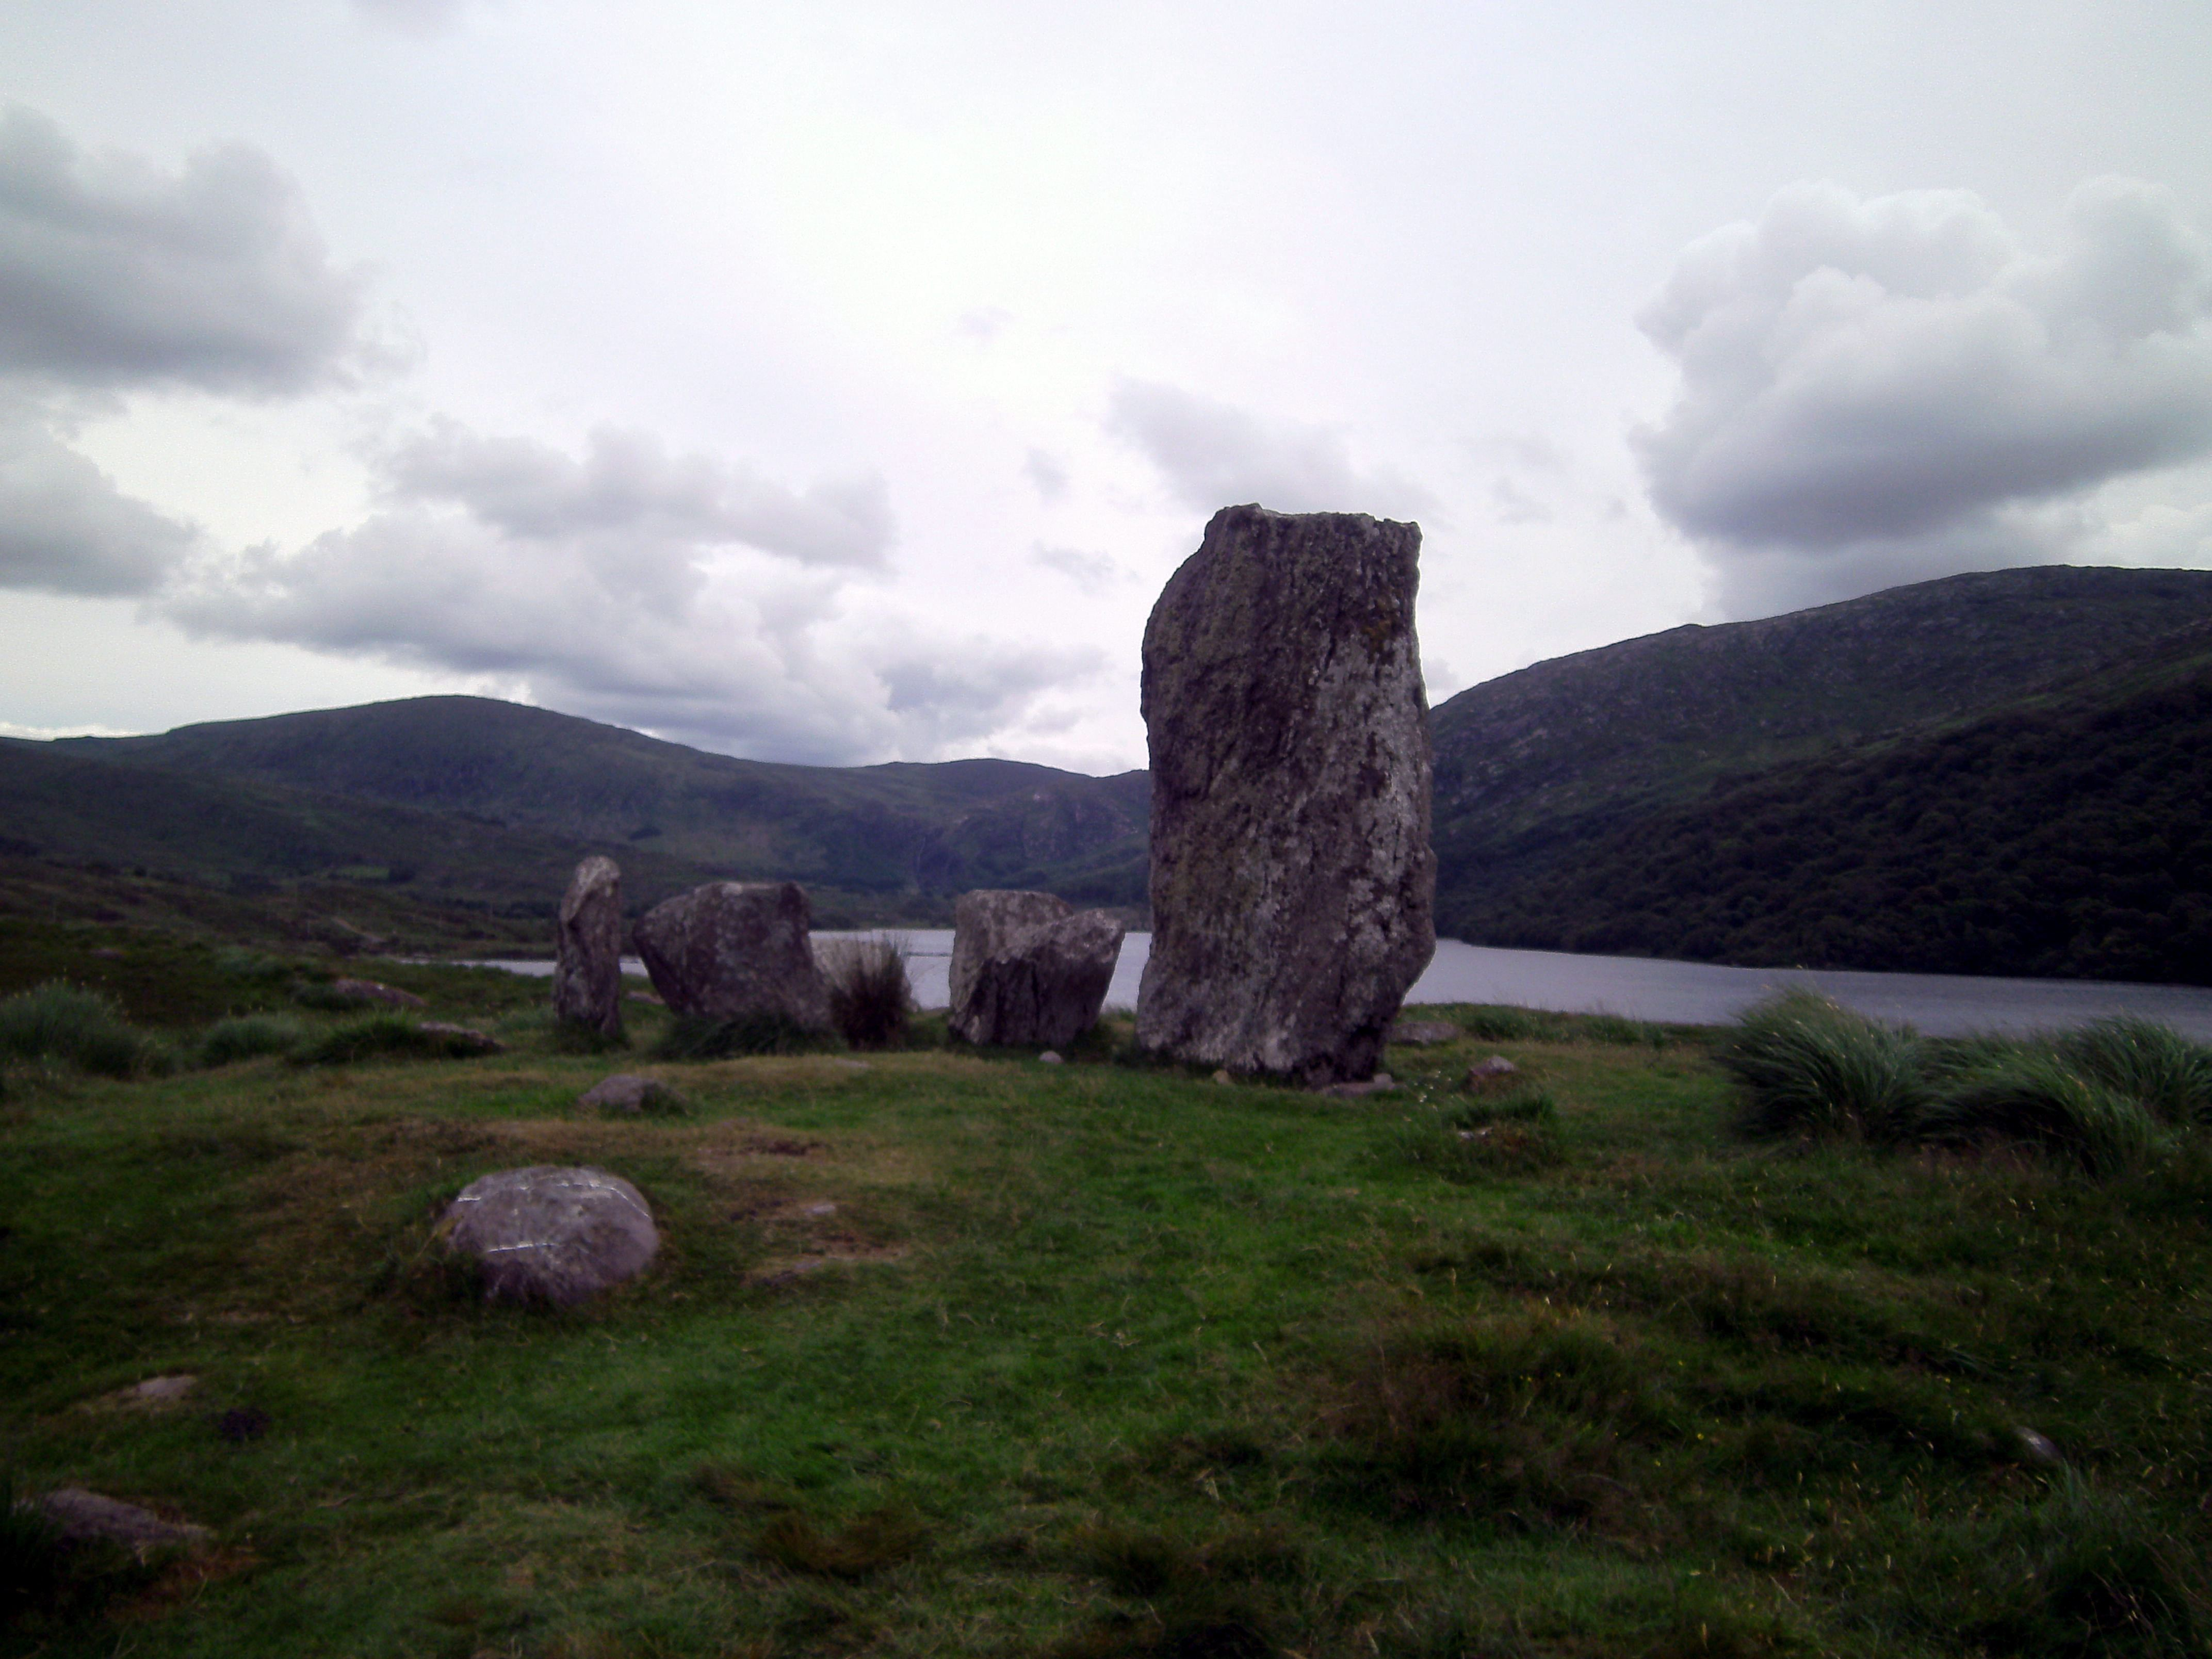 Pics from Ireland tours Uragh Stone Circle